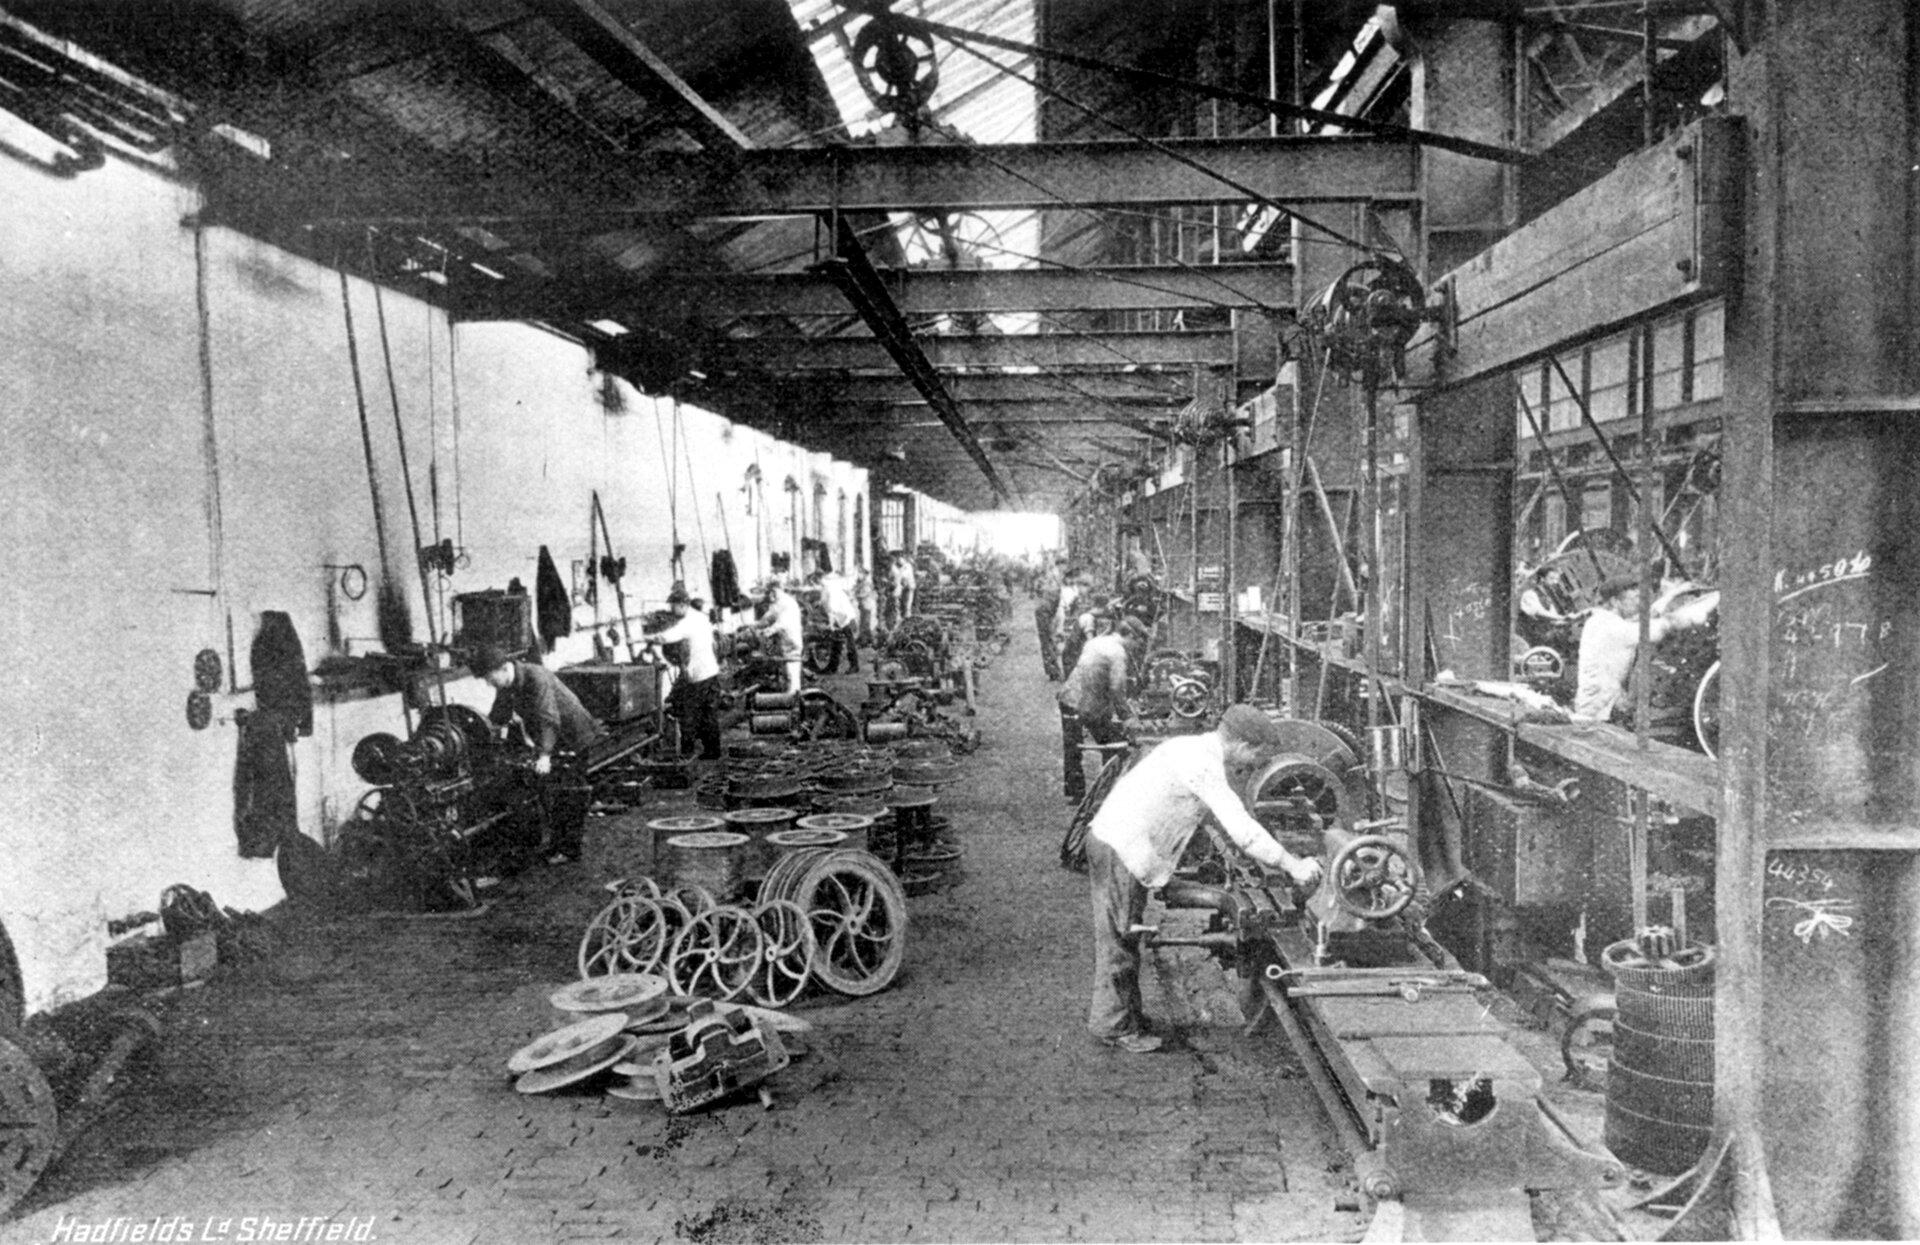 Hadfields Ltd East Hecla Works Machine Shop No 1 bay Meadowhall Sheffield